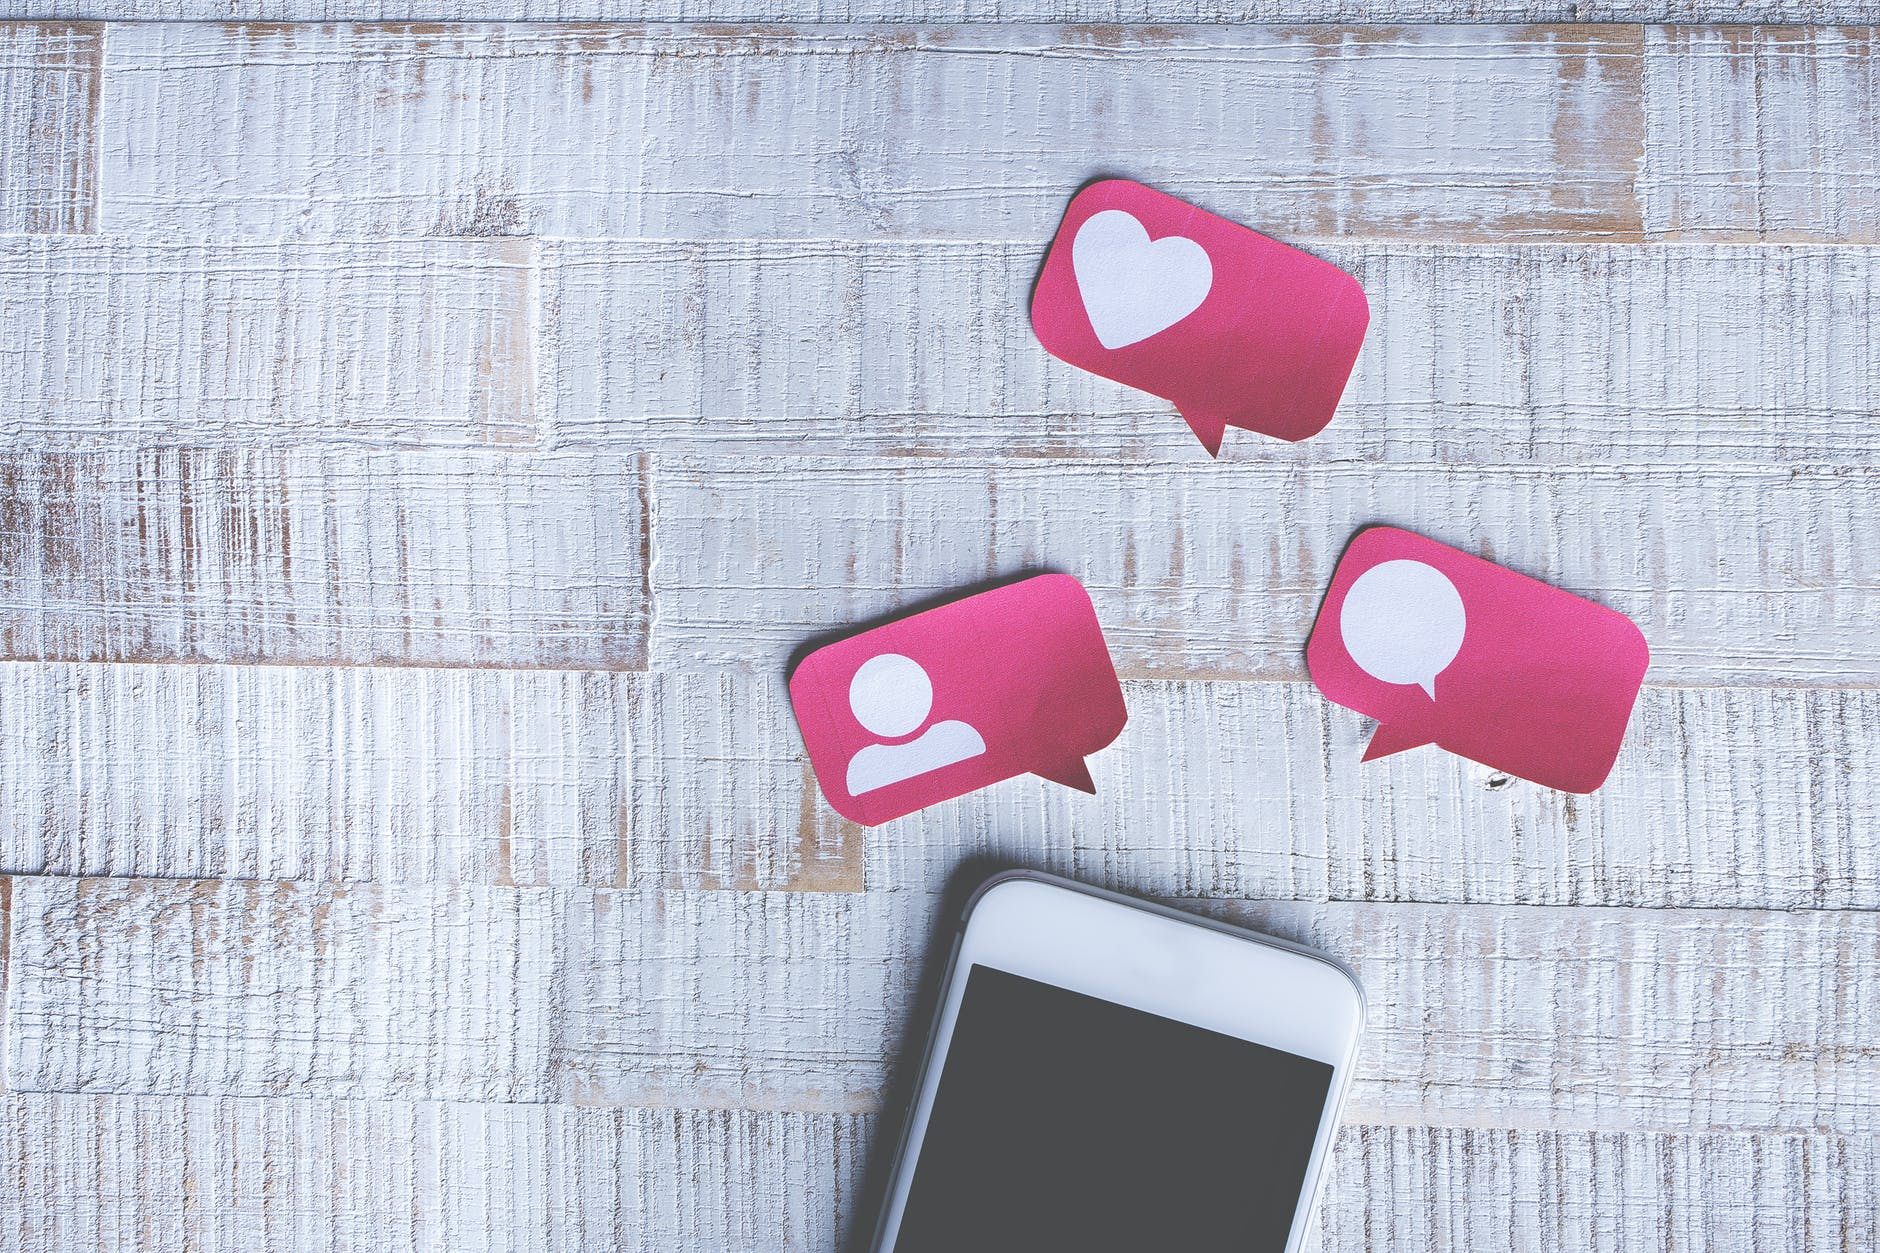 find us on social media